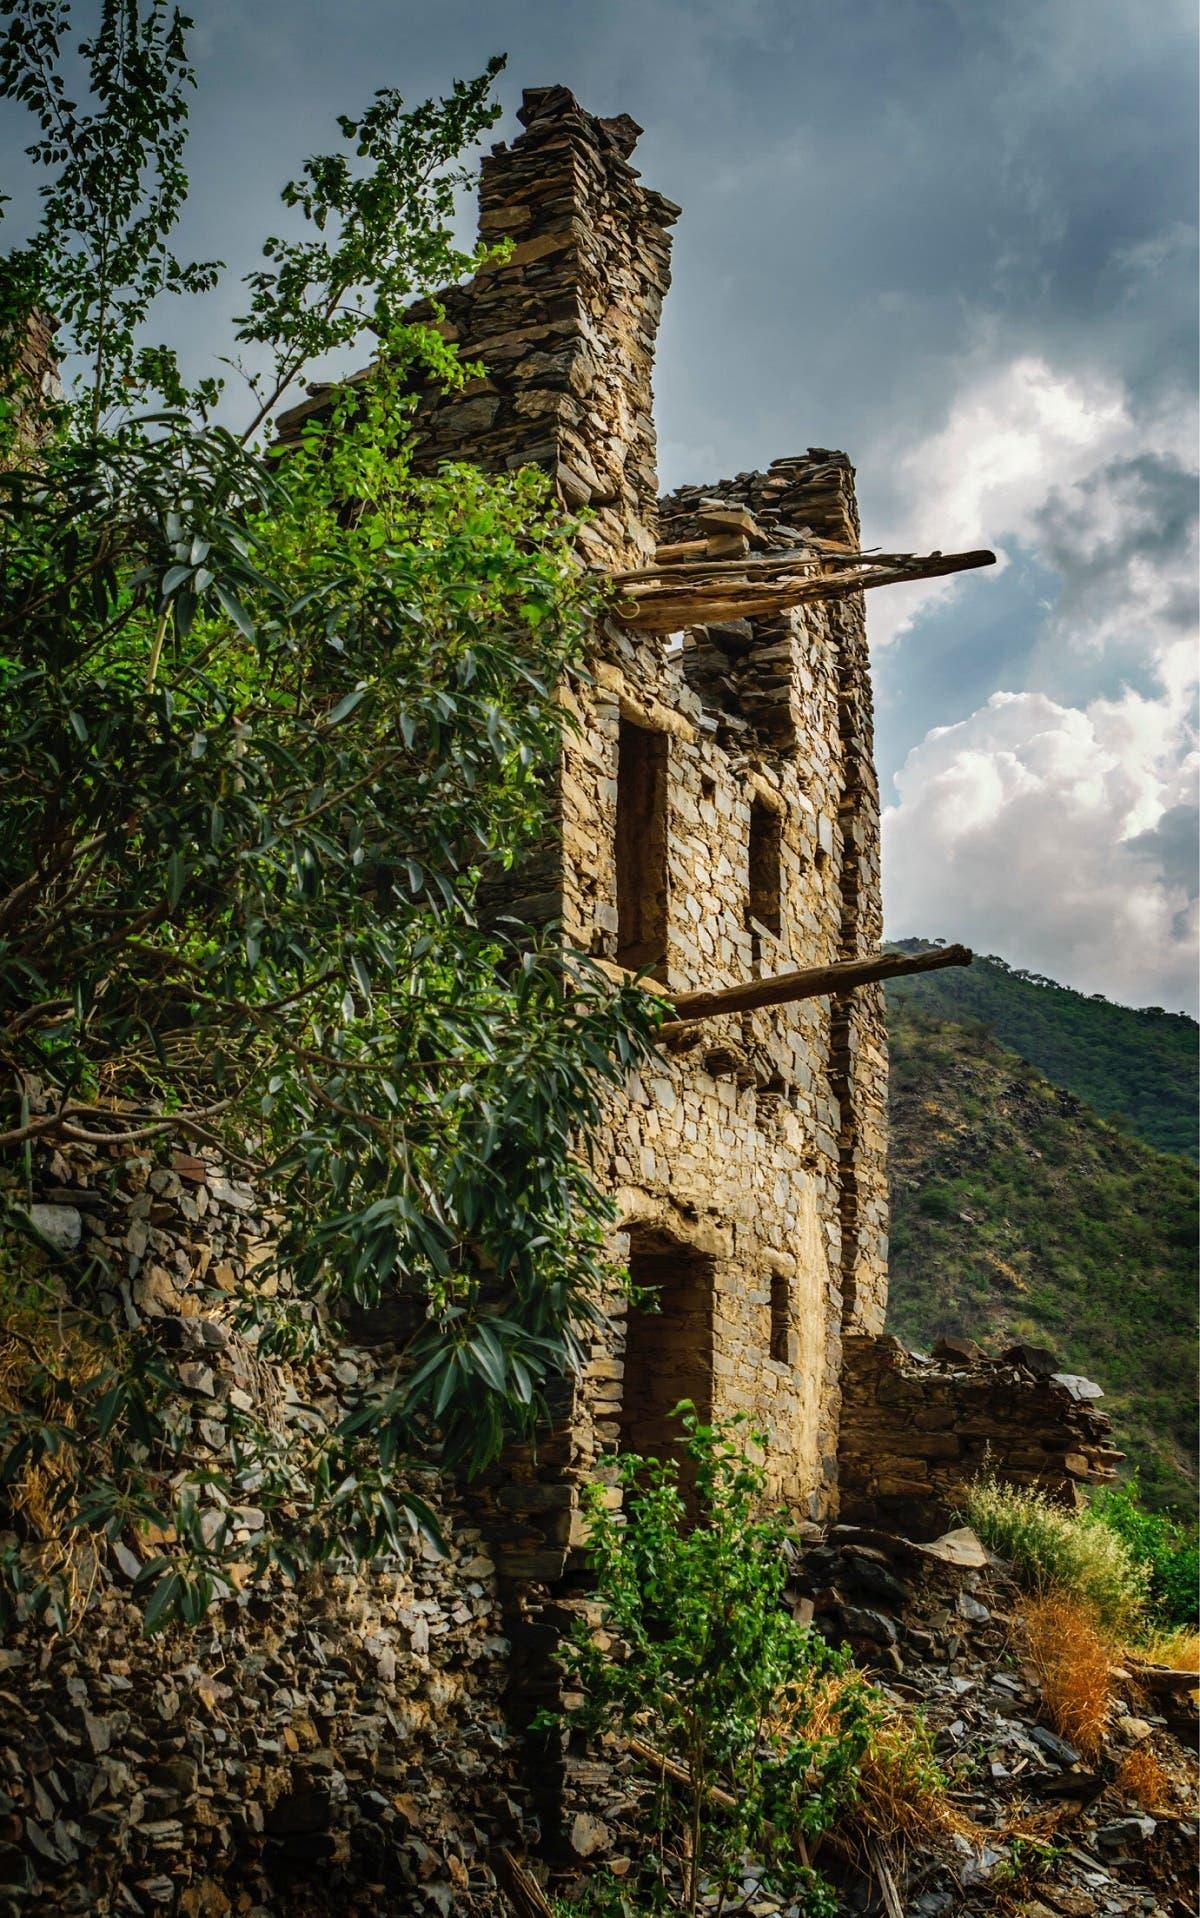 Saudi Assir mountains 3 (Asmaa Abu Qamr)